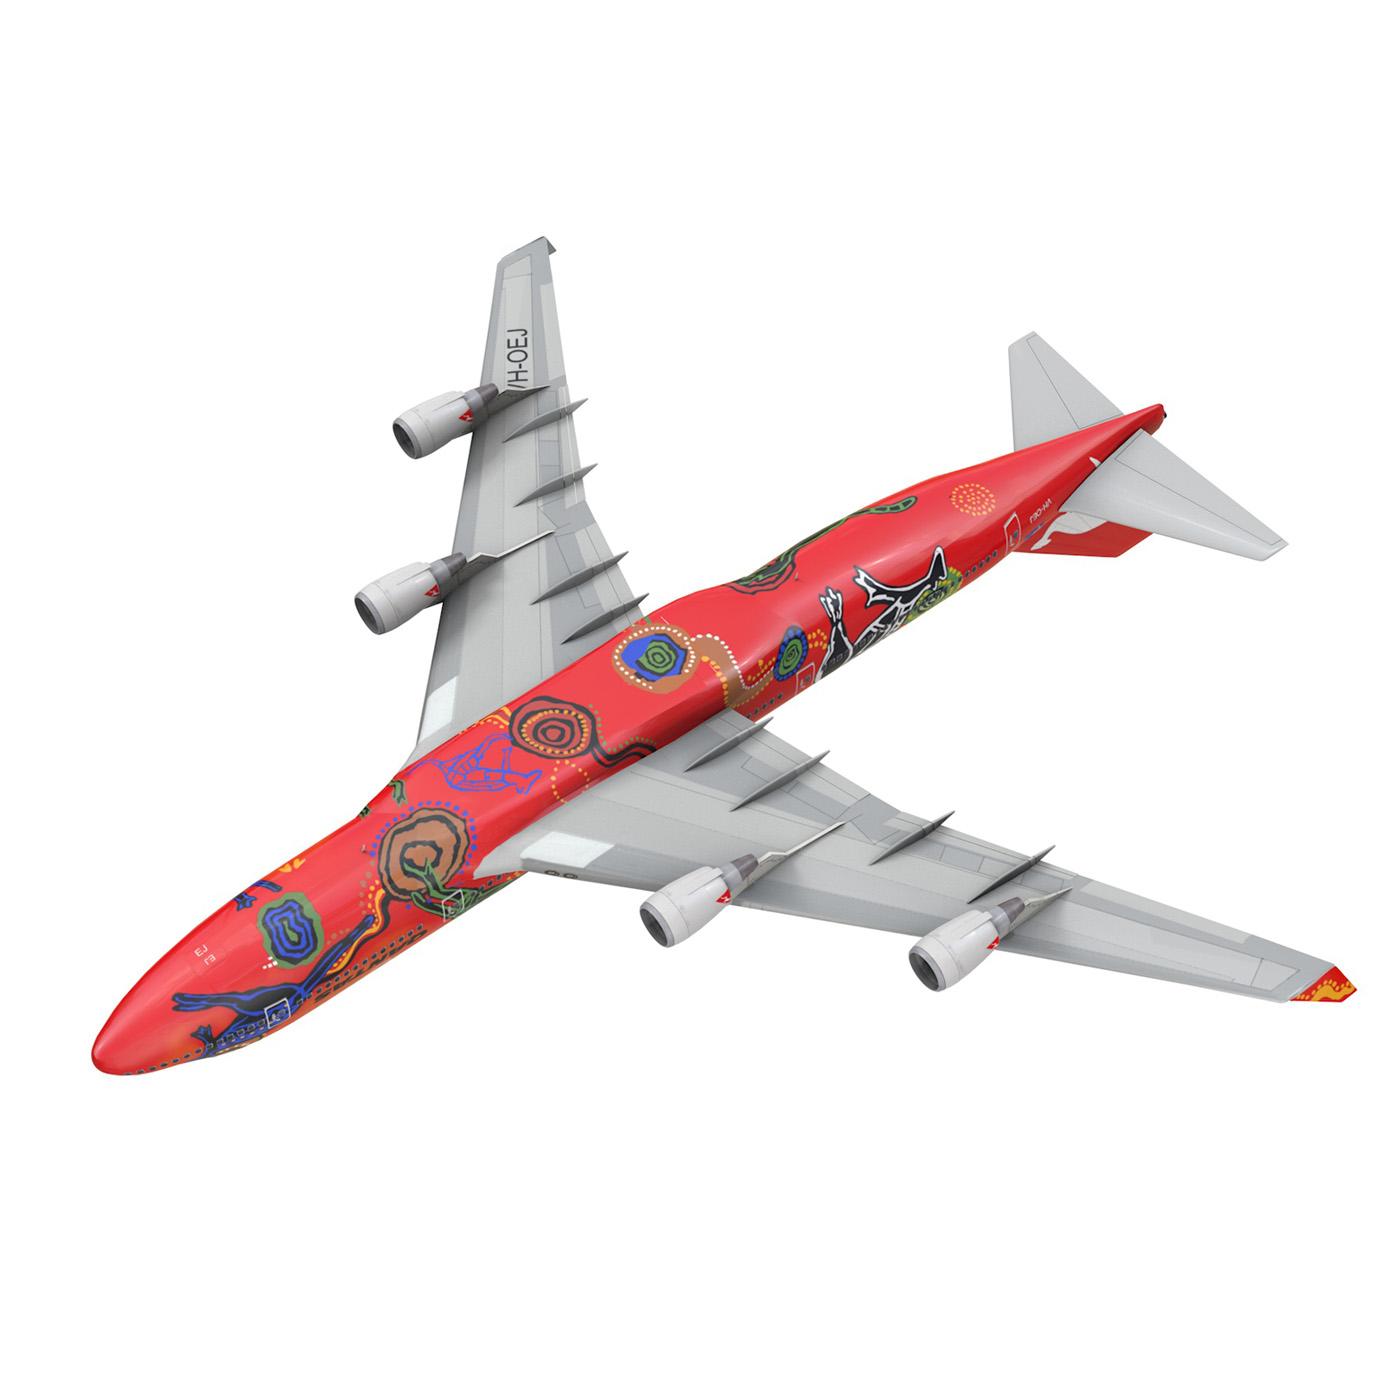 boeing 747 qantas wunala dreaming 3d model 3ds fbx c4d lwo obj 281797